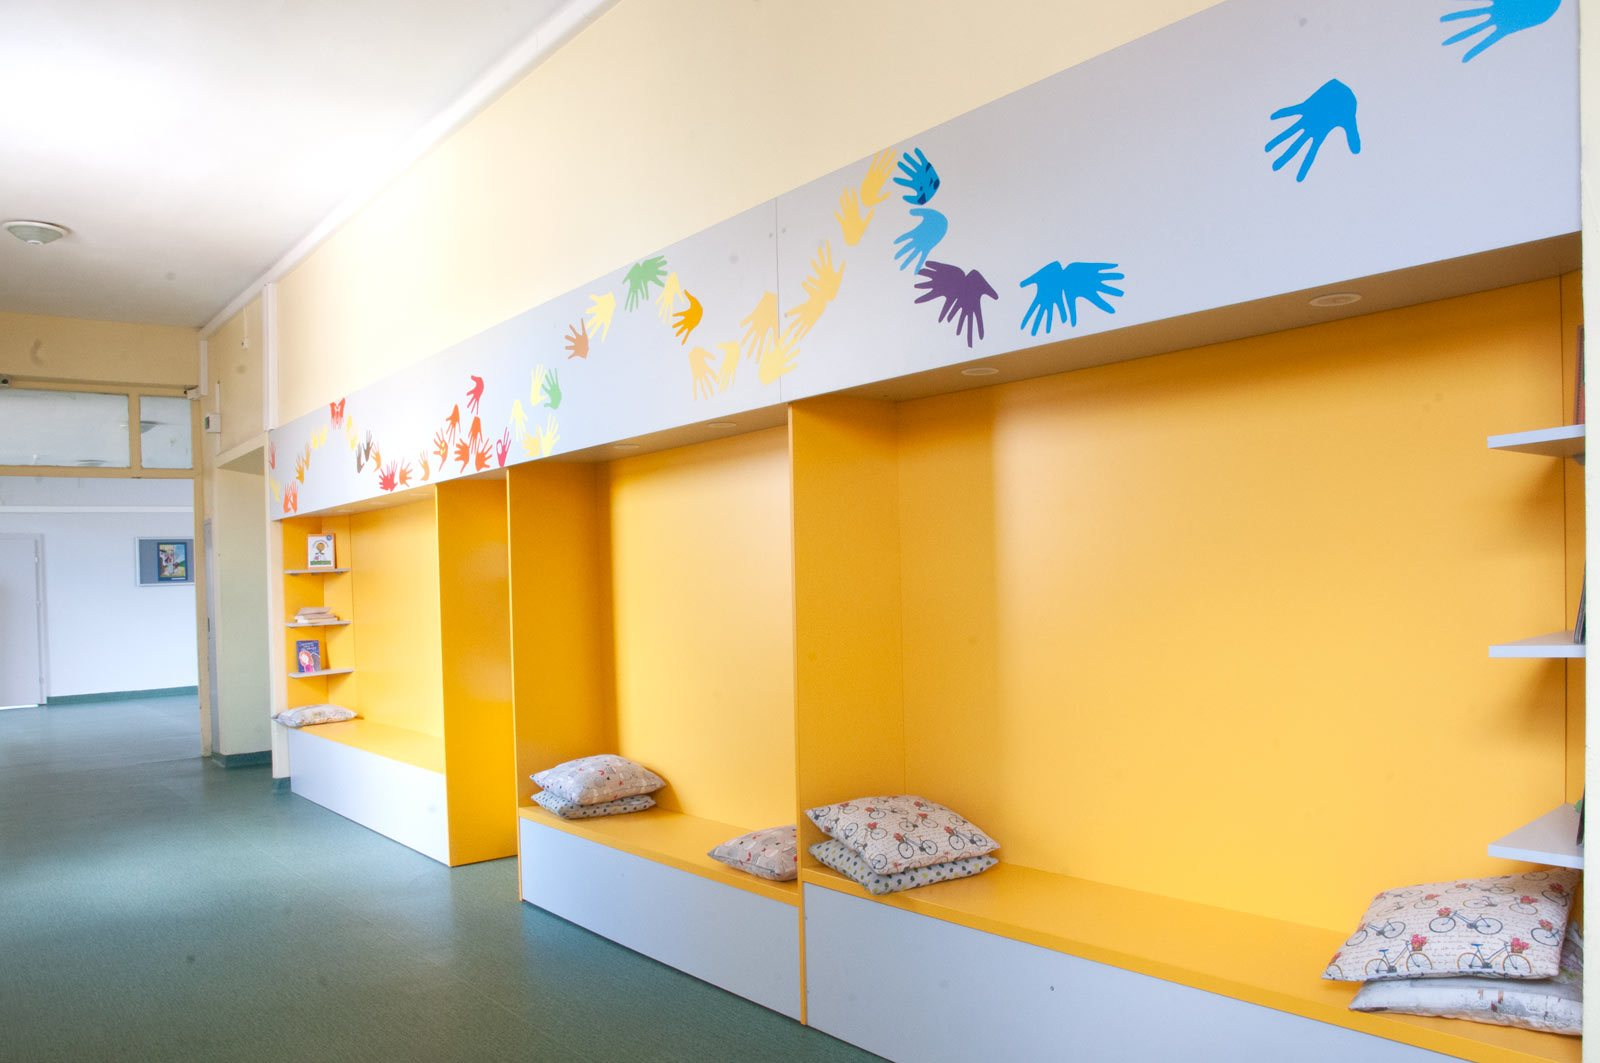 EZF1422-hallway-1